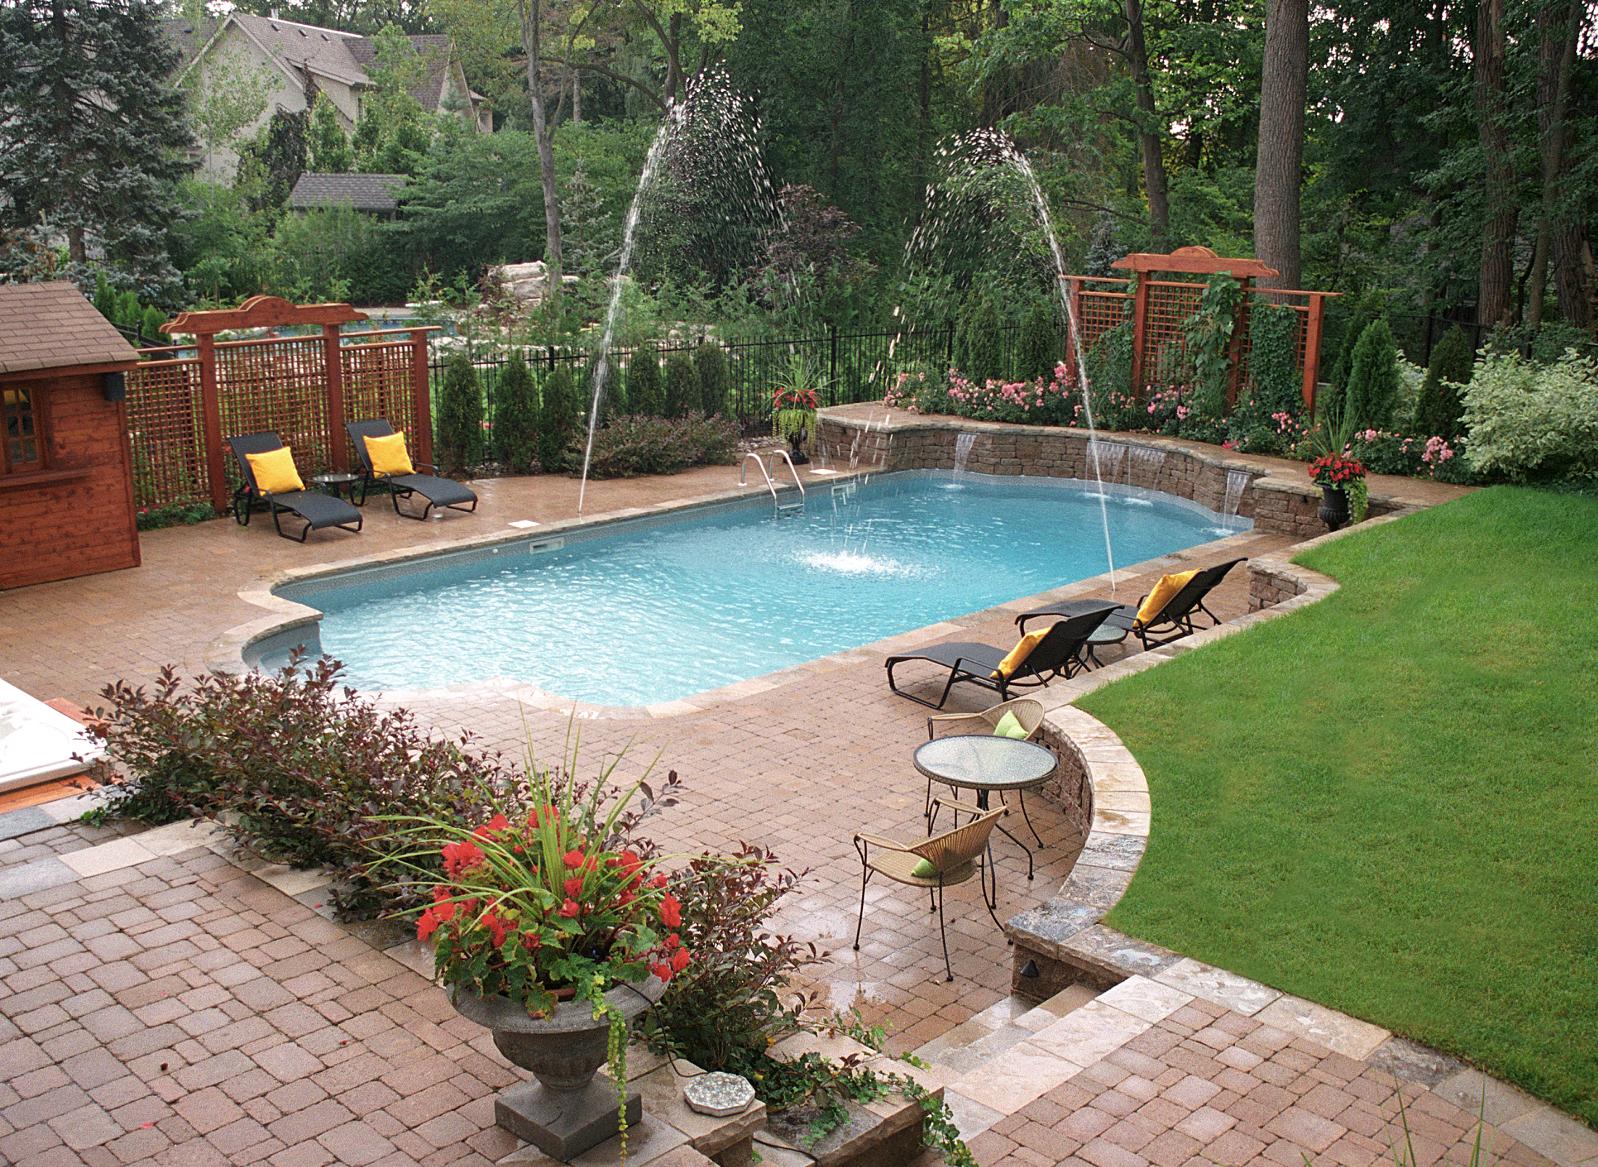 Roman Inground Pool Pioneer Family Pools Family Pool Pool Patio Inground Pools